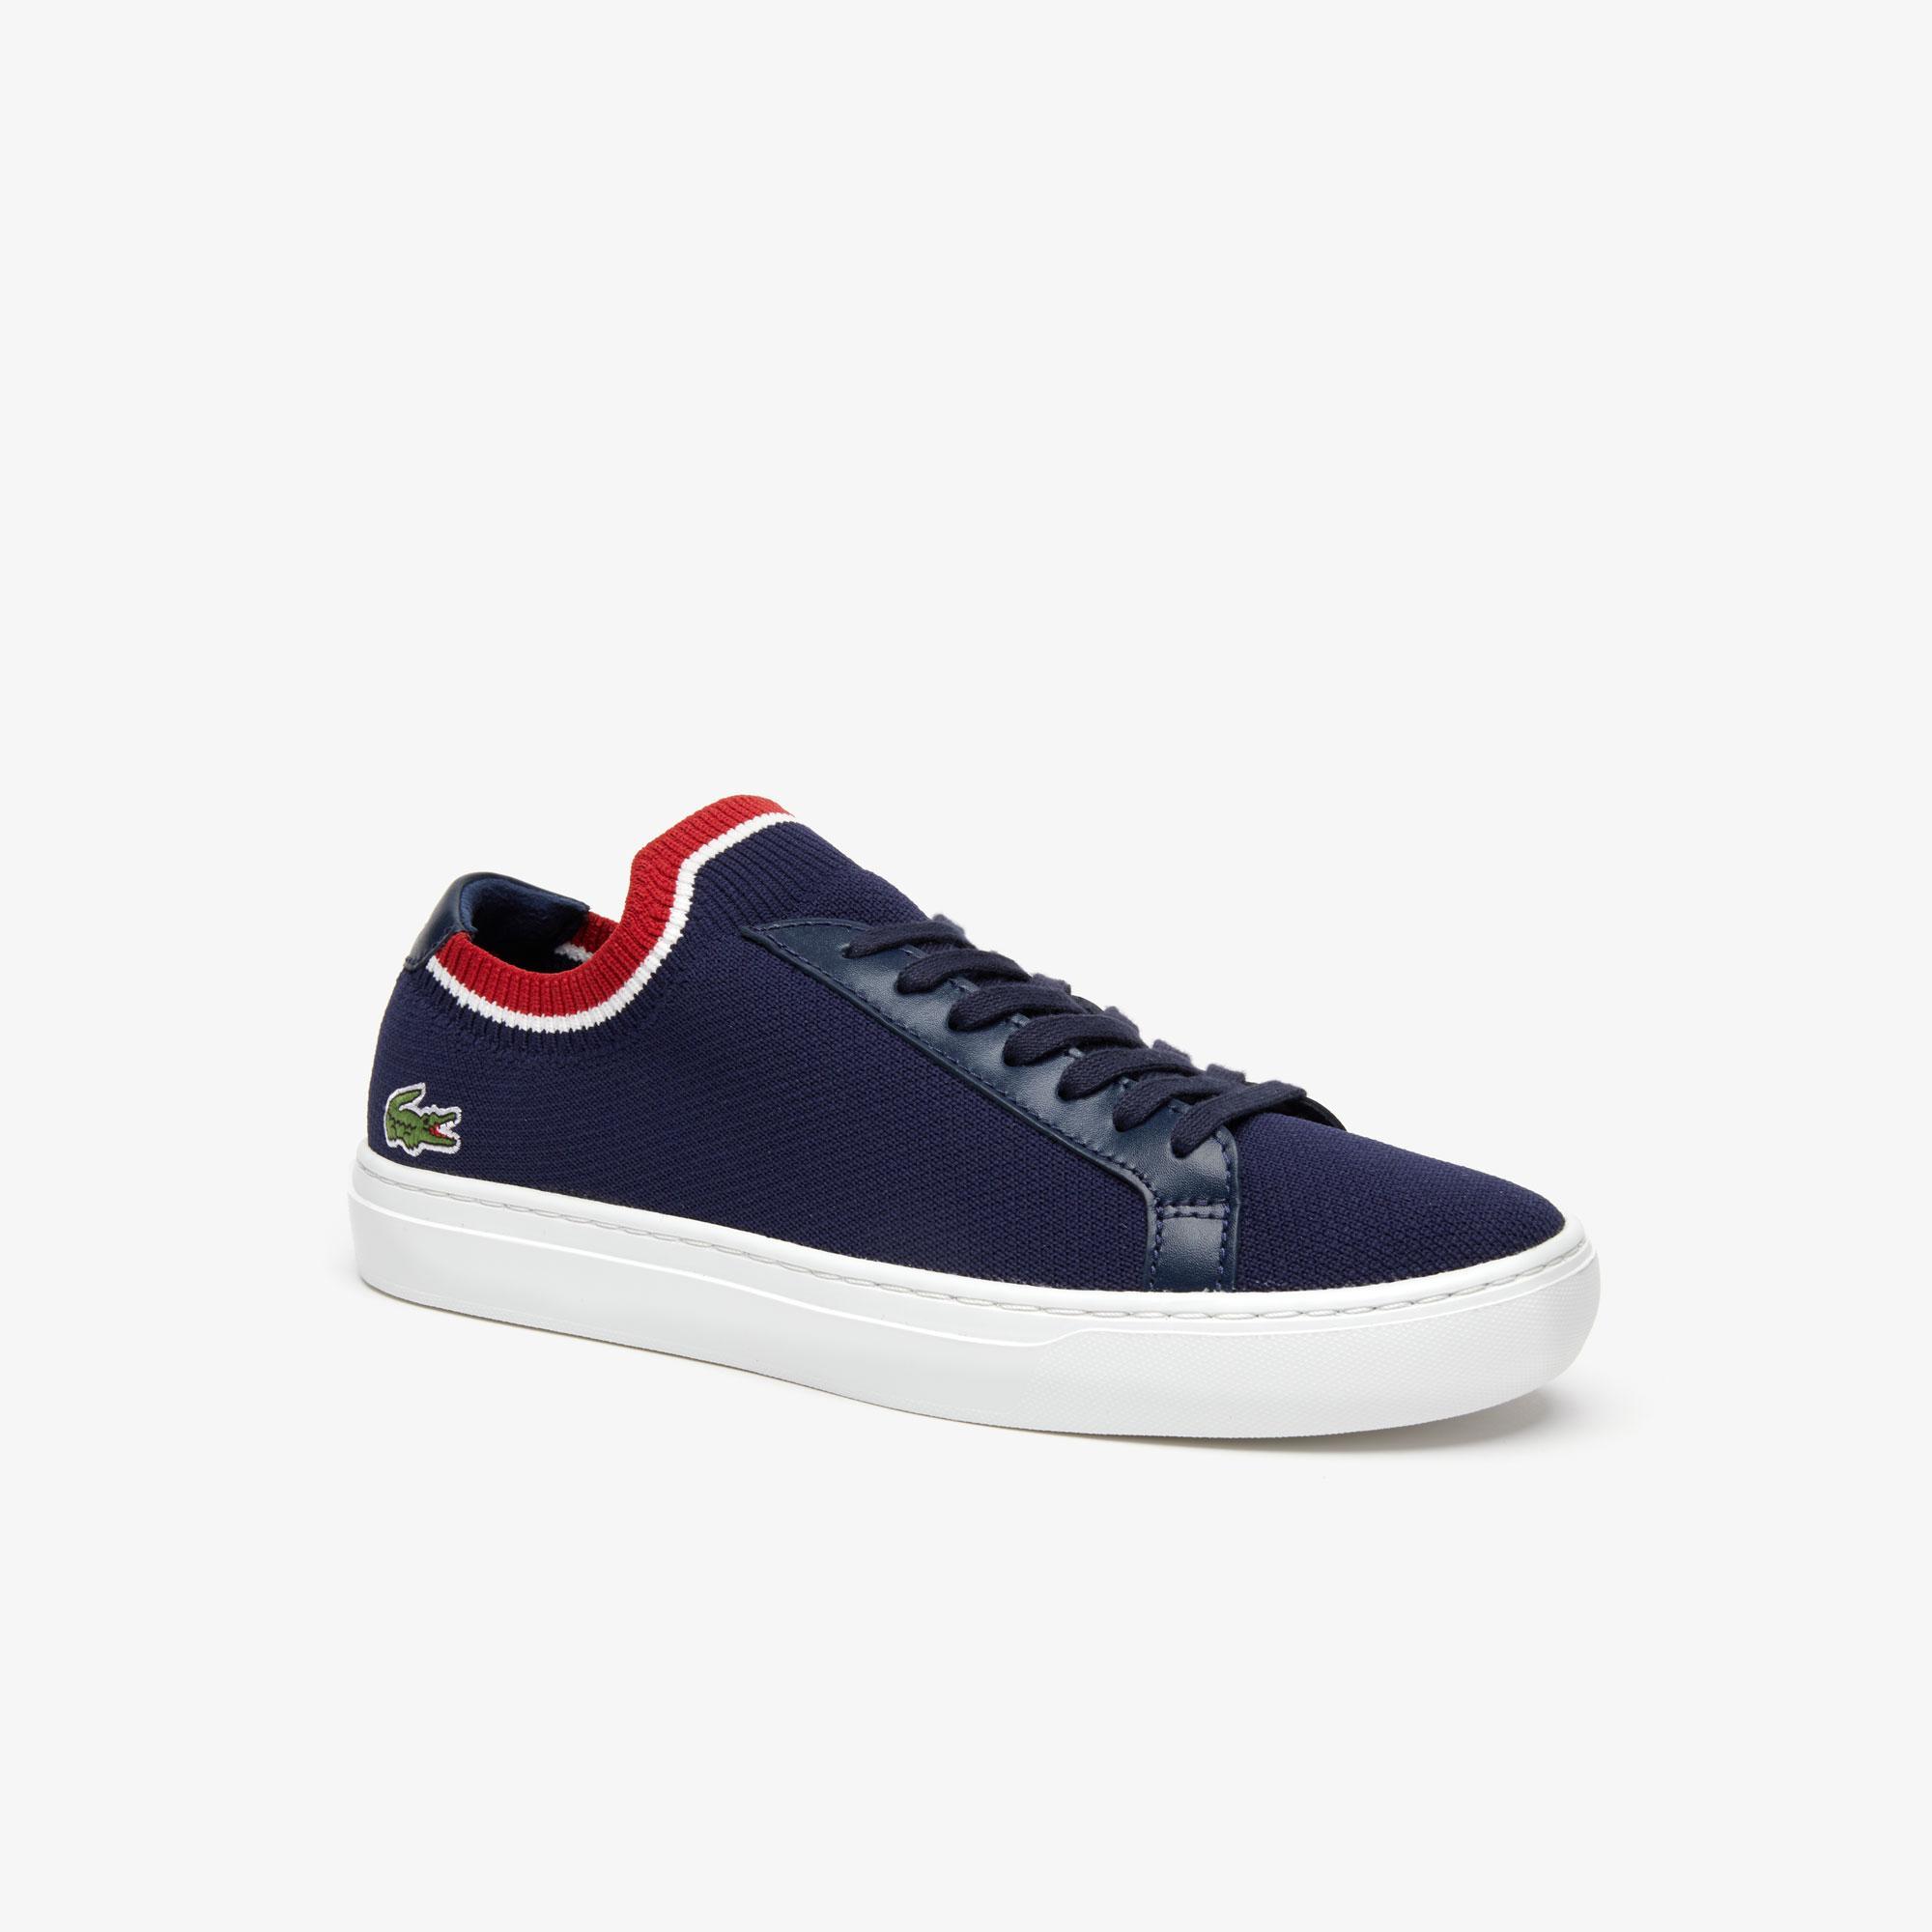 Lacoste La Piquee 119 1 Men's Sneakers